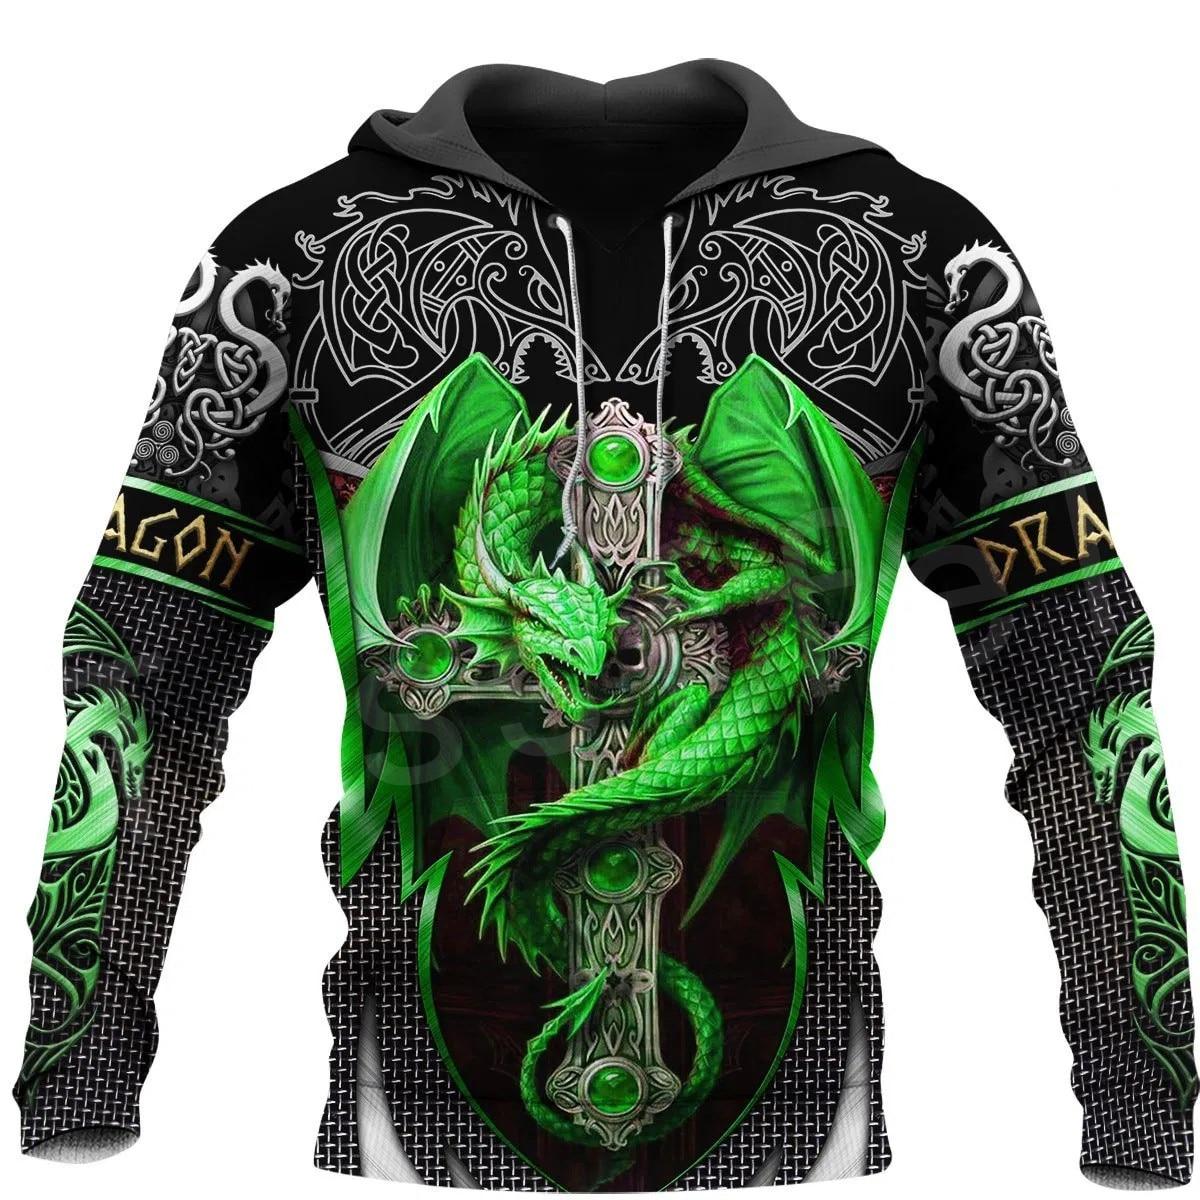 Tessffel Animal Art Fly Dragon Symbol Tattoo Unisex 3DPrint Tracksuit Newfashion Streetwear Zipper/Sweatshirts/Hoodies/Jacket S1